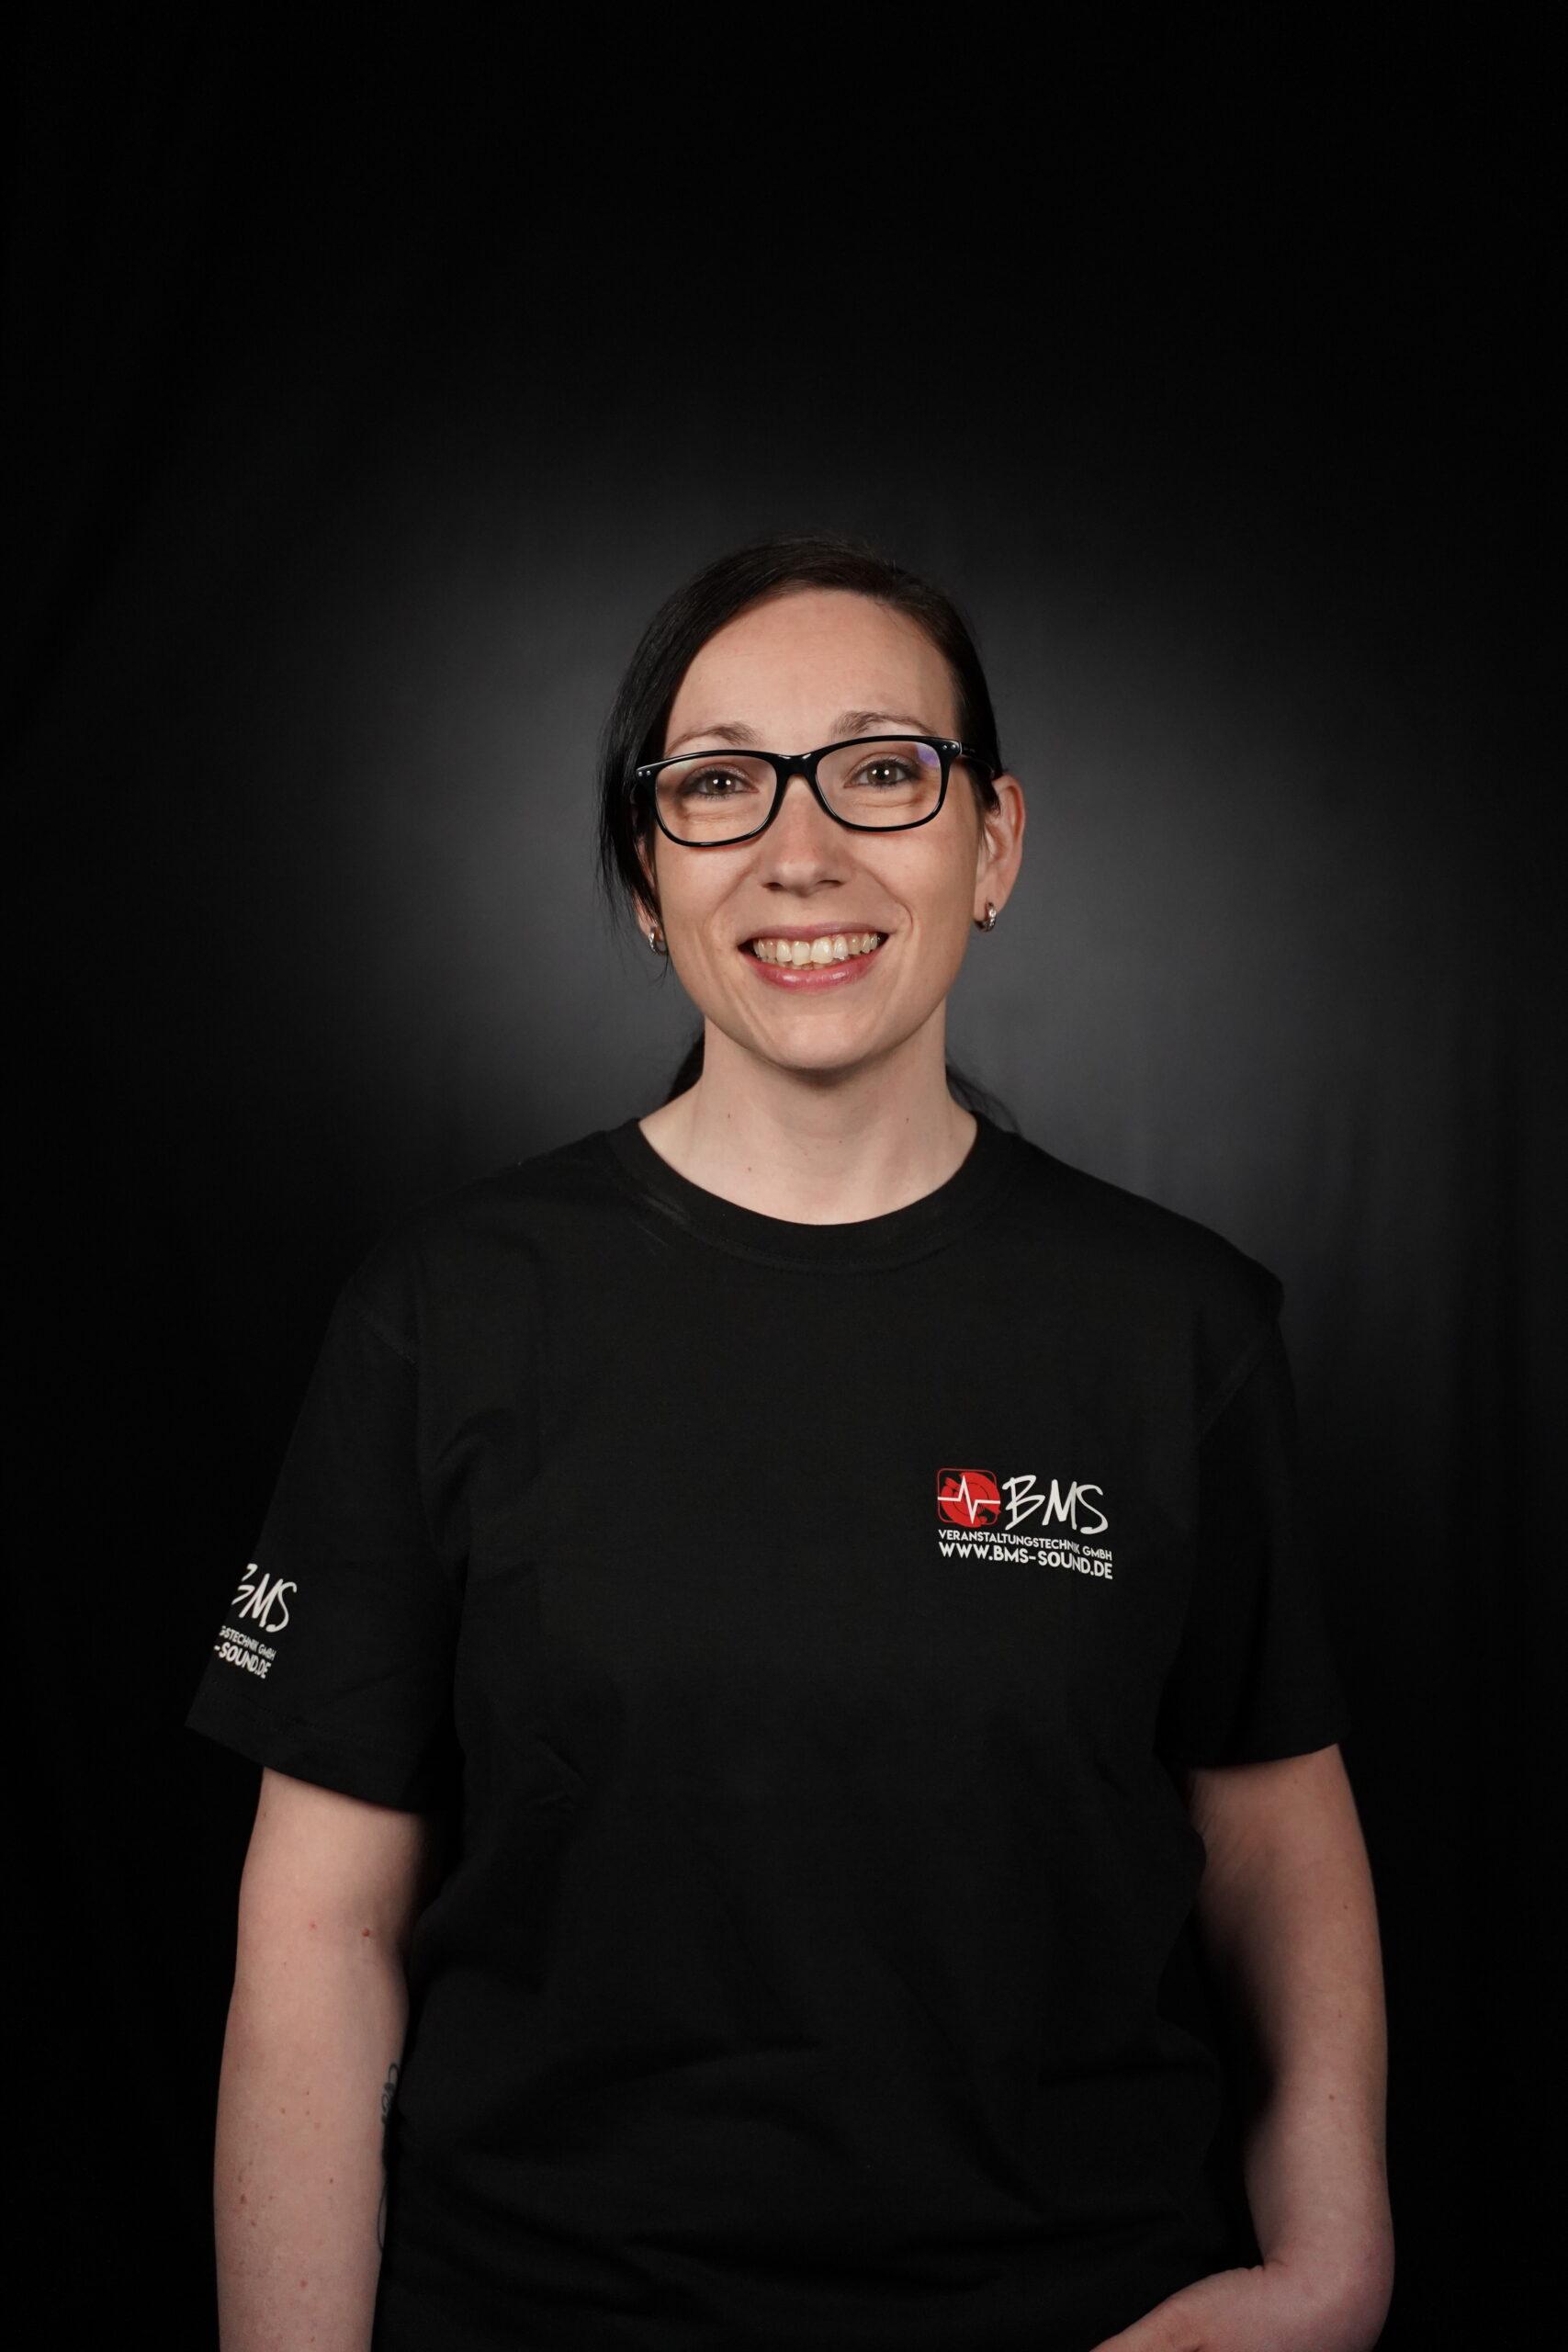 Sandra Hornecker BMS Veranstaltungstechnik GmbH